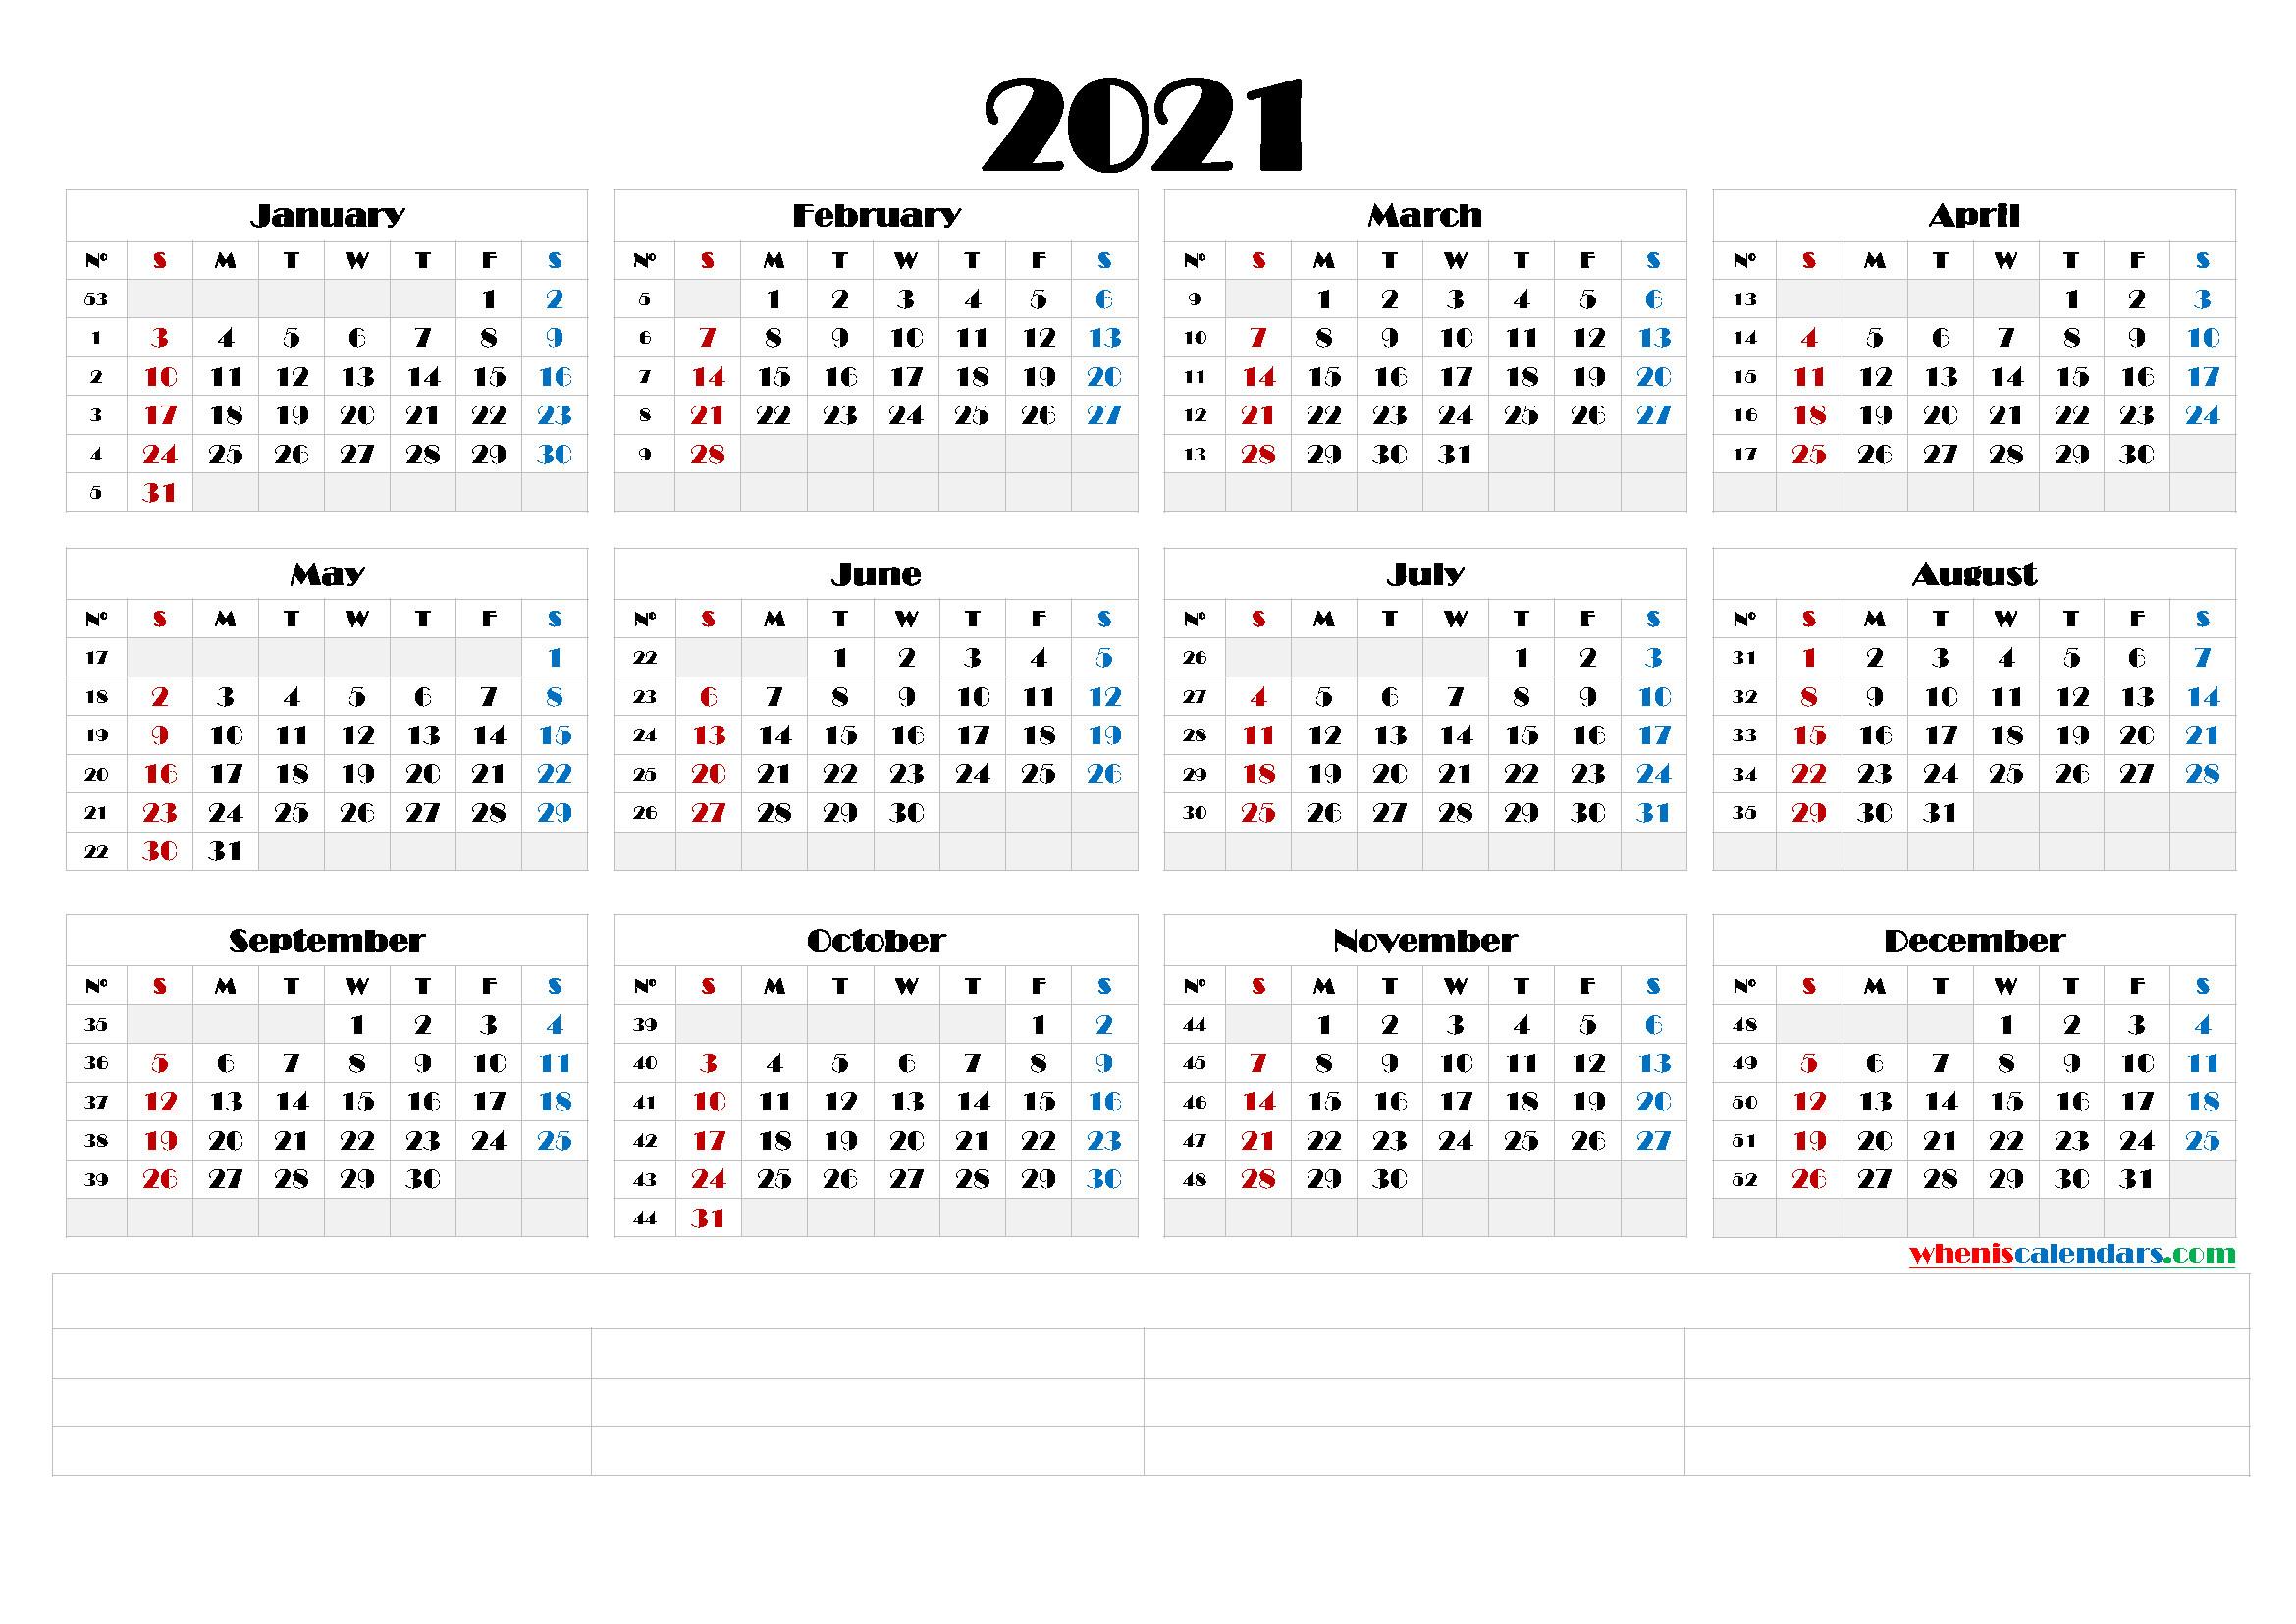 Free 12 Month Word Calendar Template 2021 - 2021 Calendar  2021 12 Month Calendar Printable Free Pdf